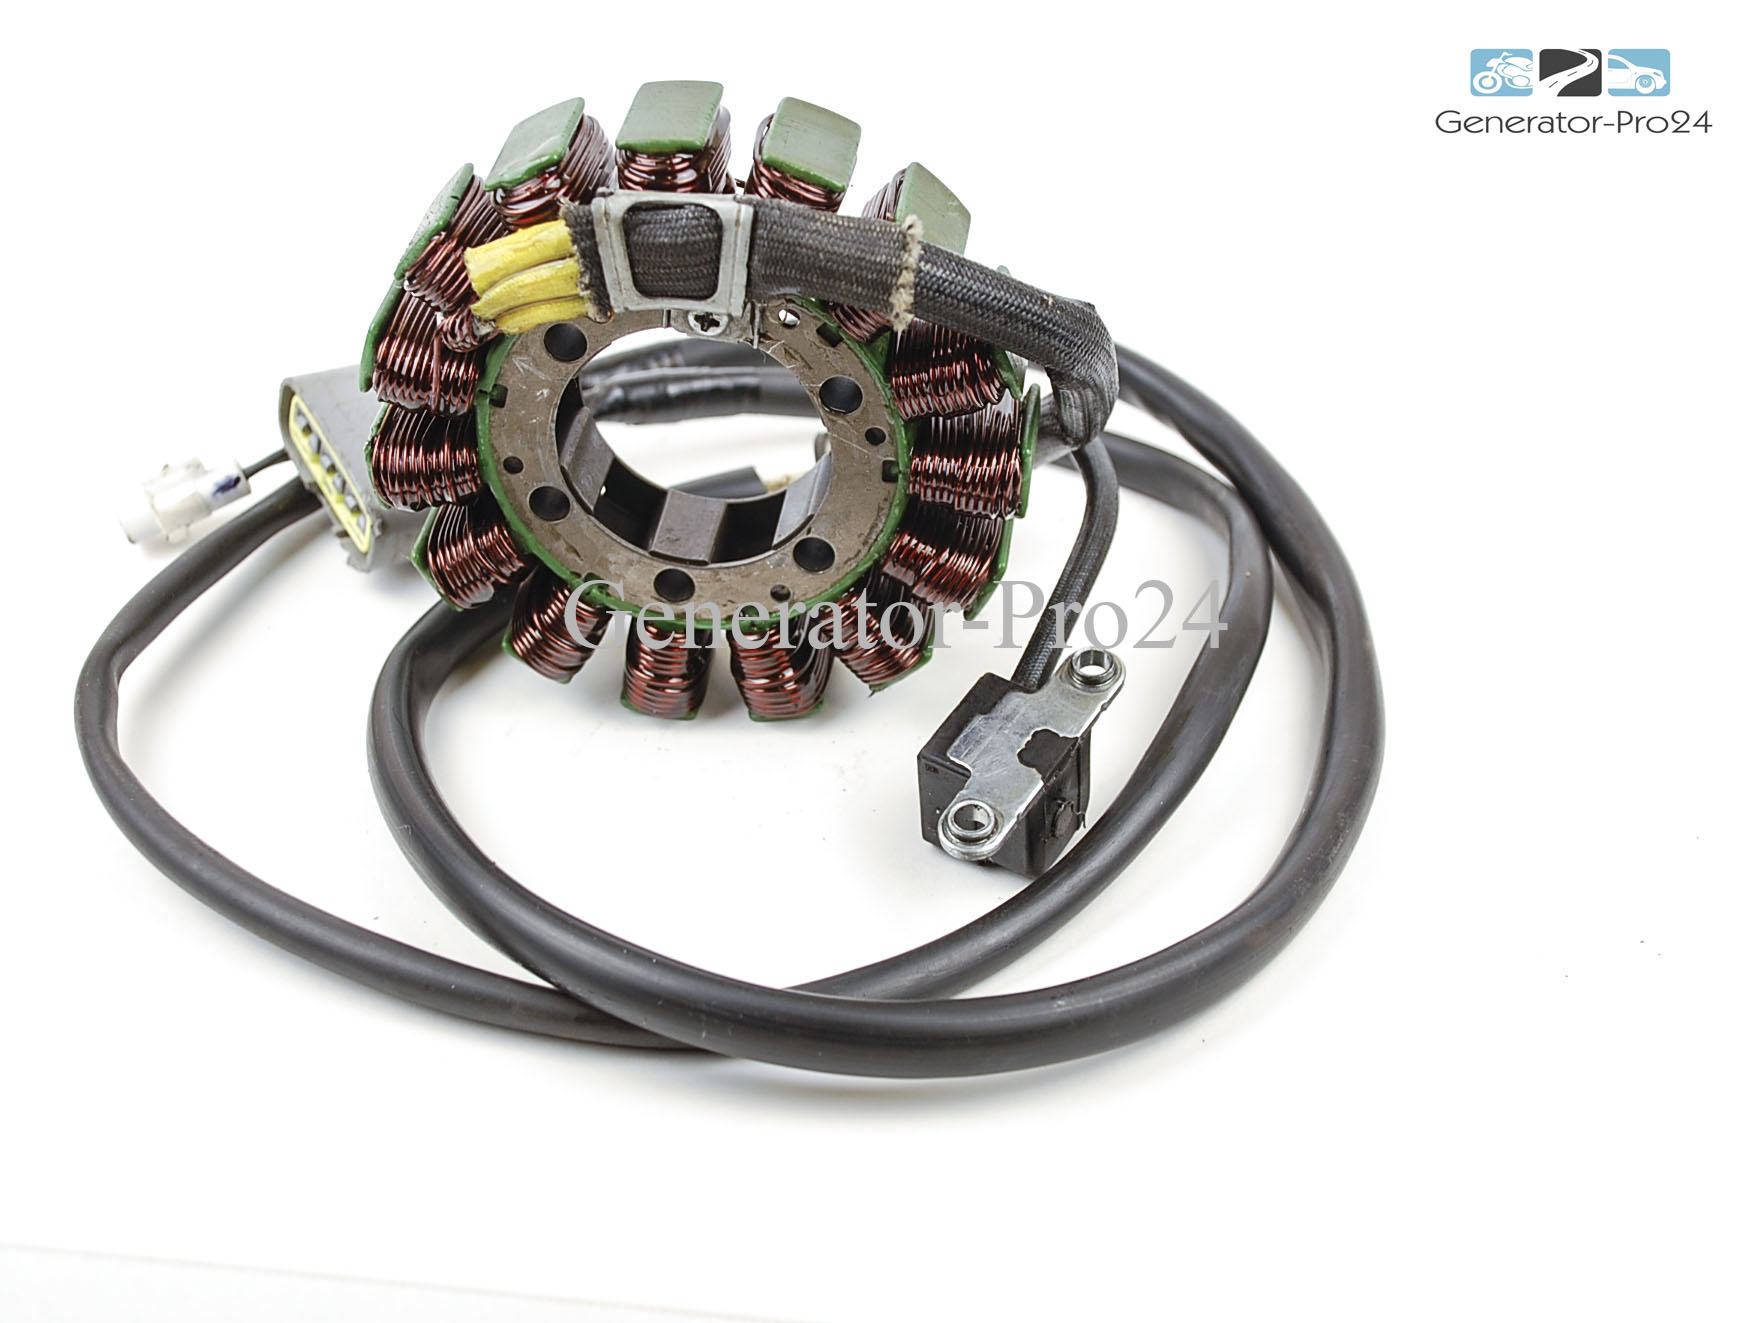 YAMAHA Stator Ass'y, 28P-81410-01-00   Generator-Pro24